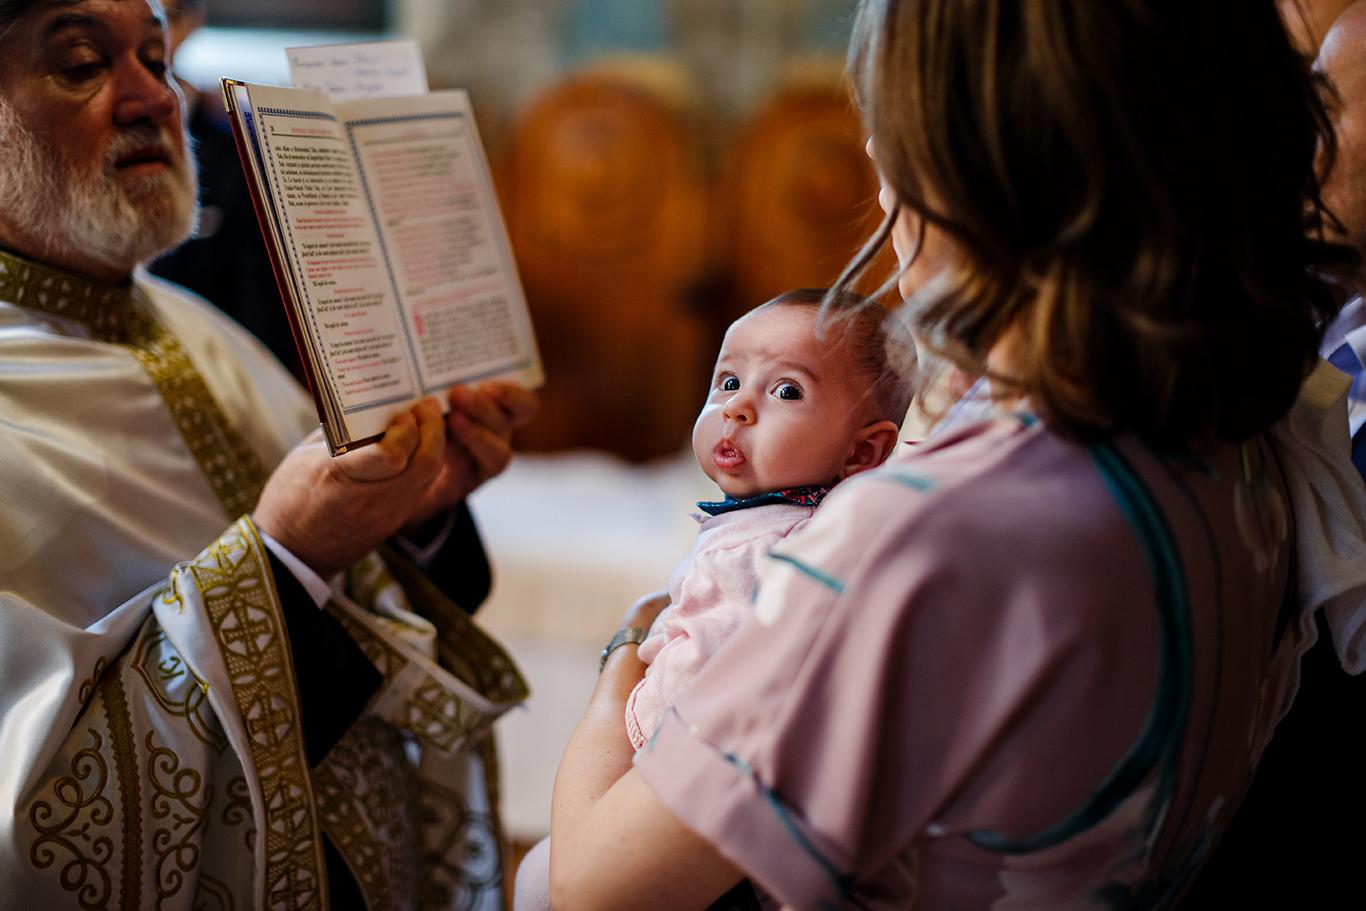 Oare ce vrea sa zica nenea asta intreaba micuta Ruxi la botez